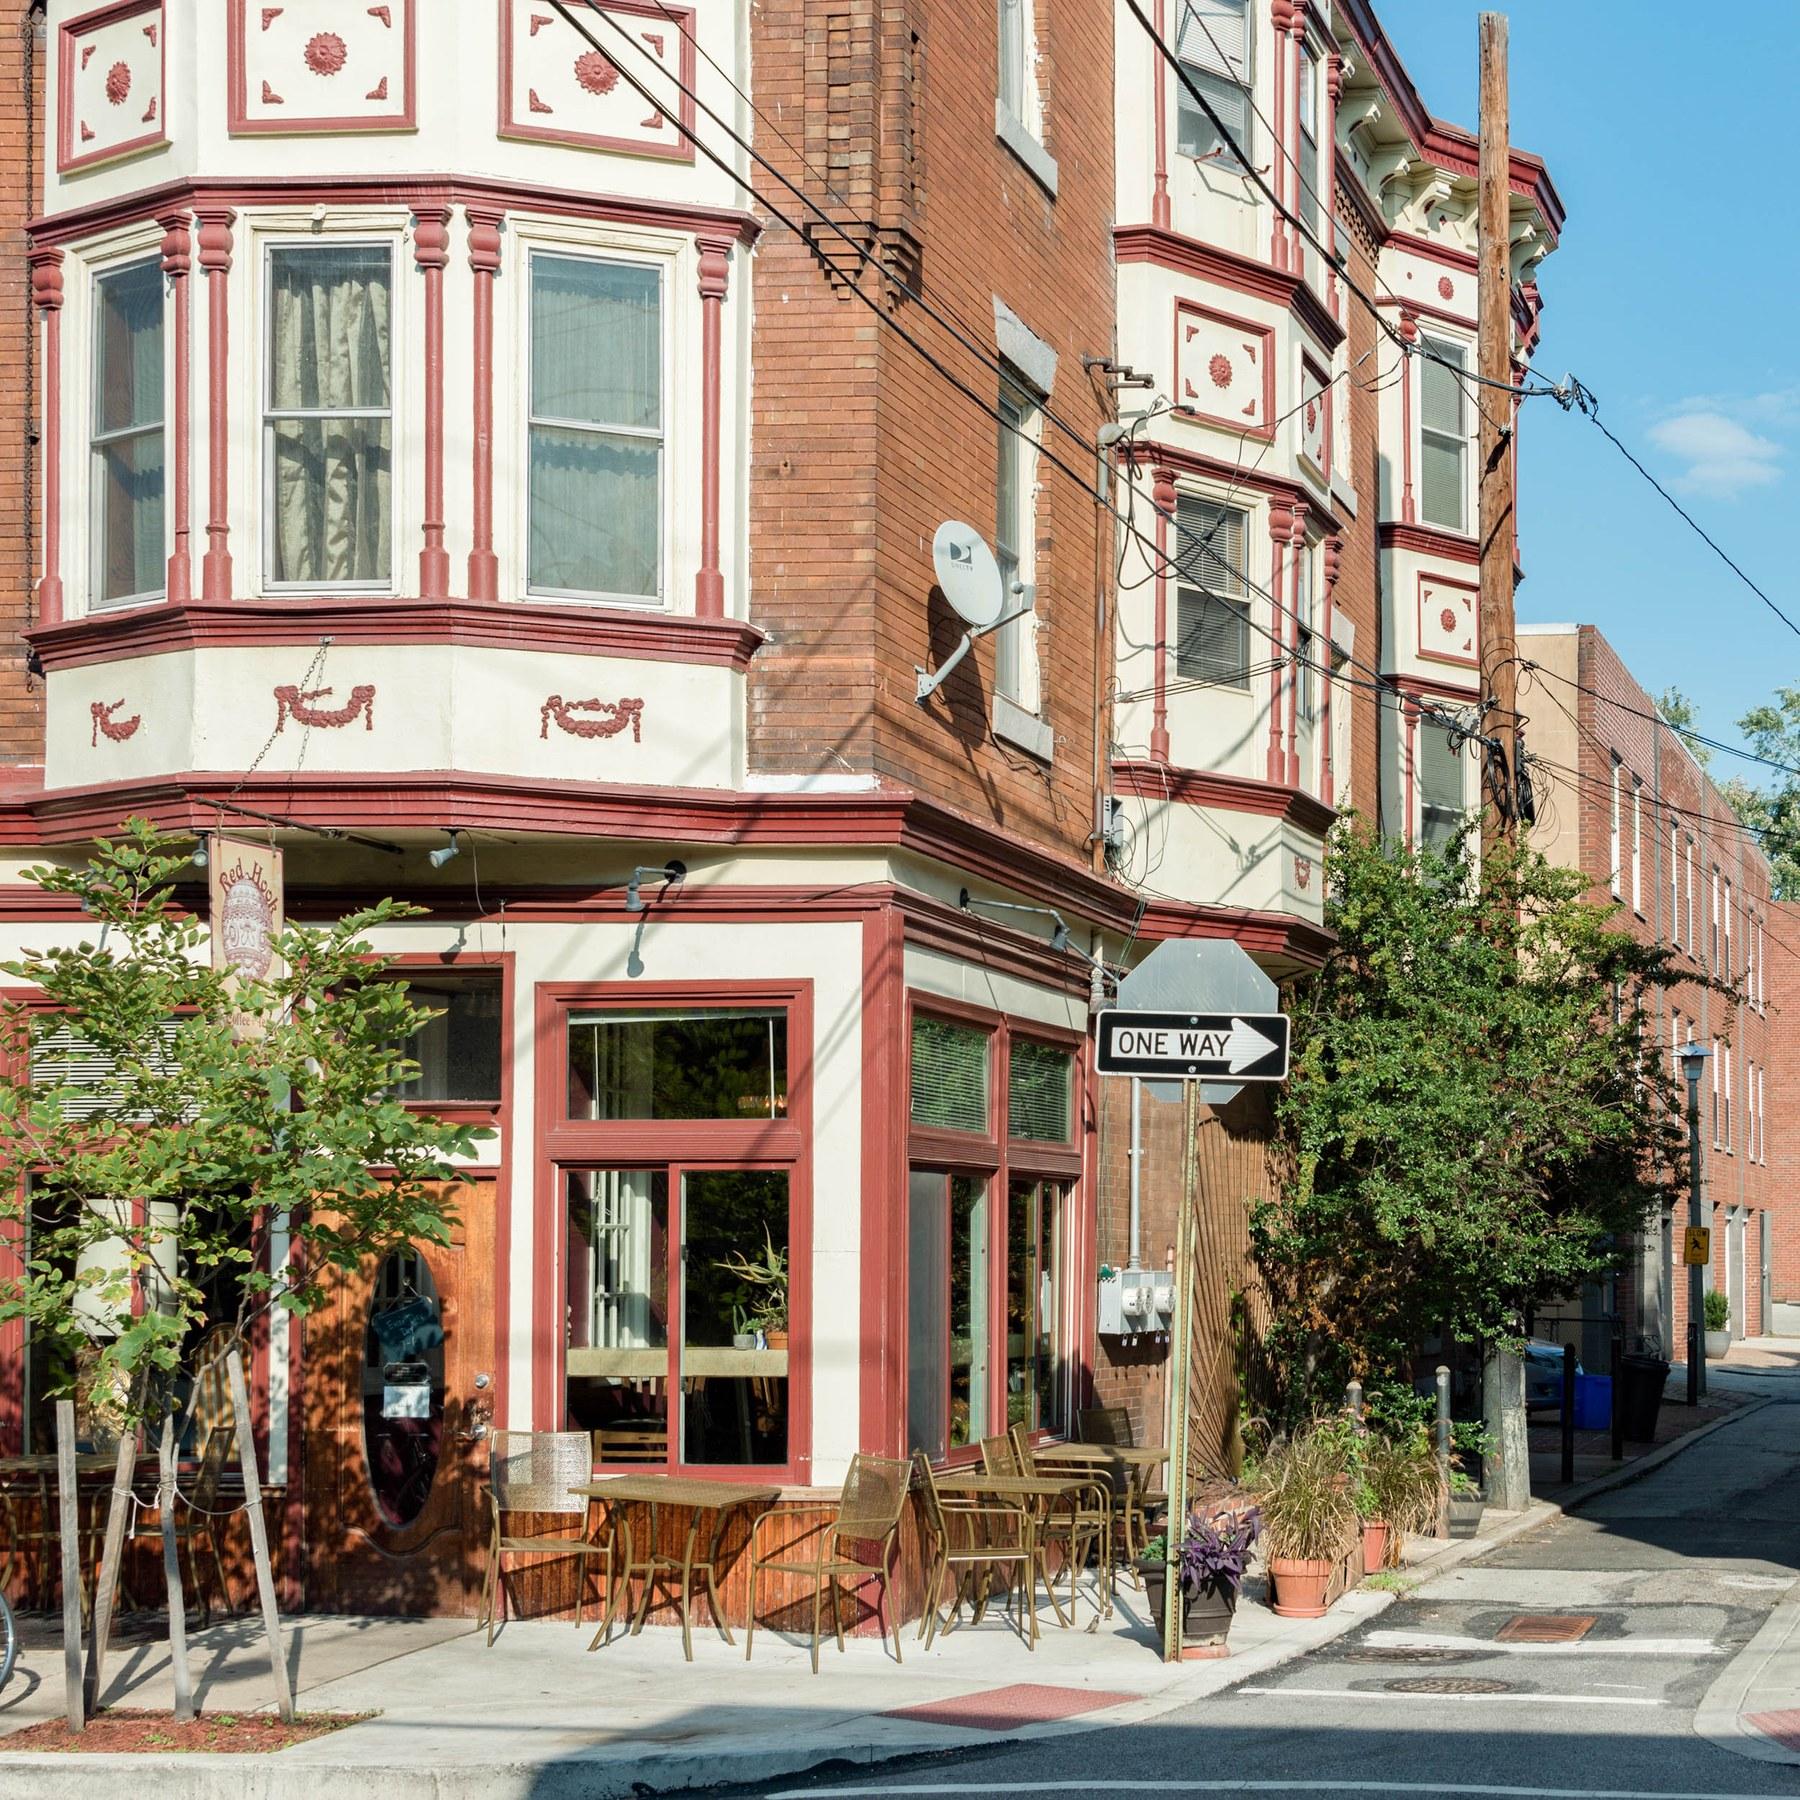 Local Com Homes For Rent: Queen Village, Philadelphia PA - Neighborhood Guide